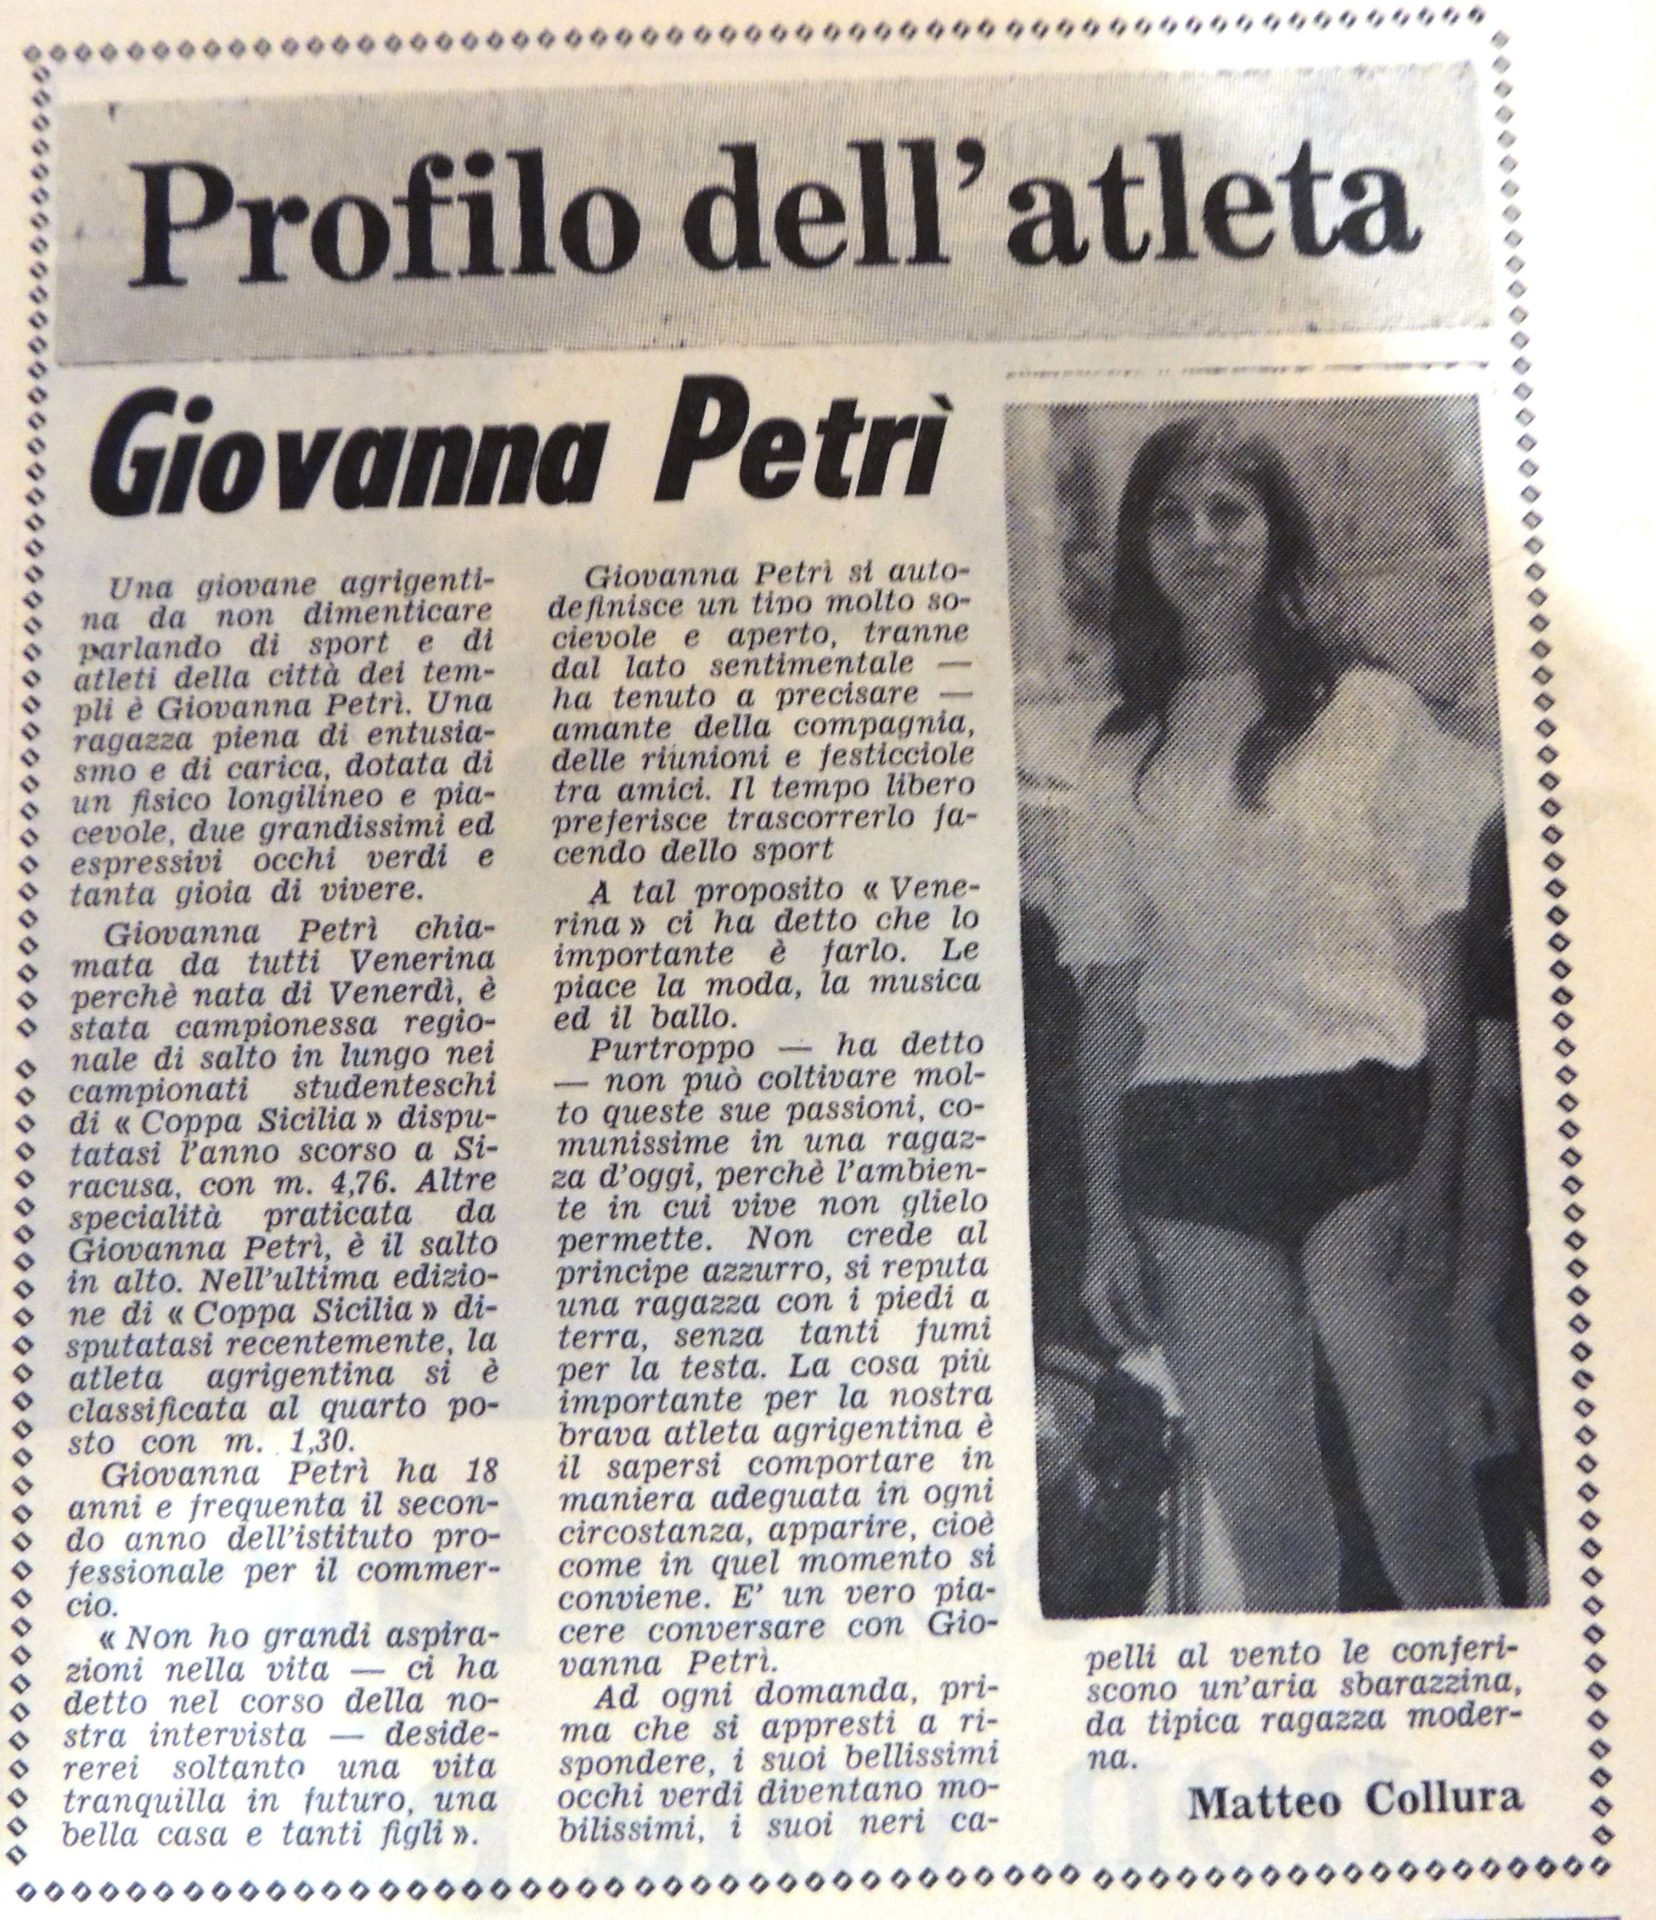 Agrigento Sport. Campioni d'altri tempi. Giovanna Petrì (atletica leggera)